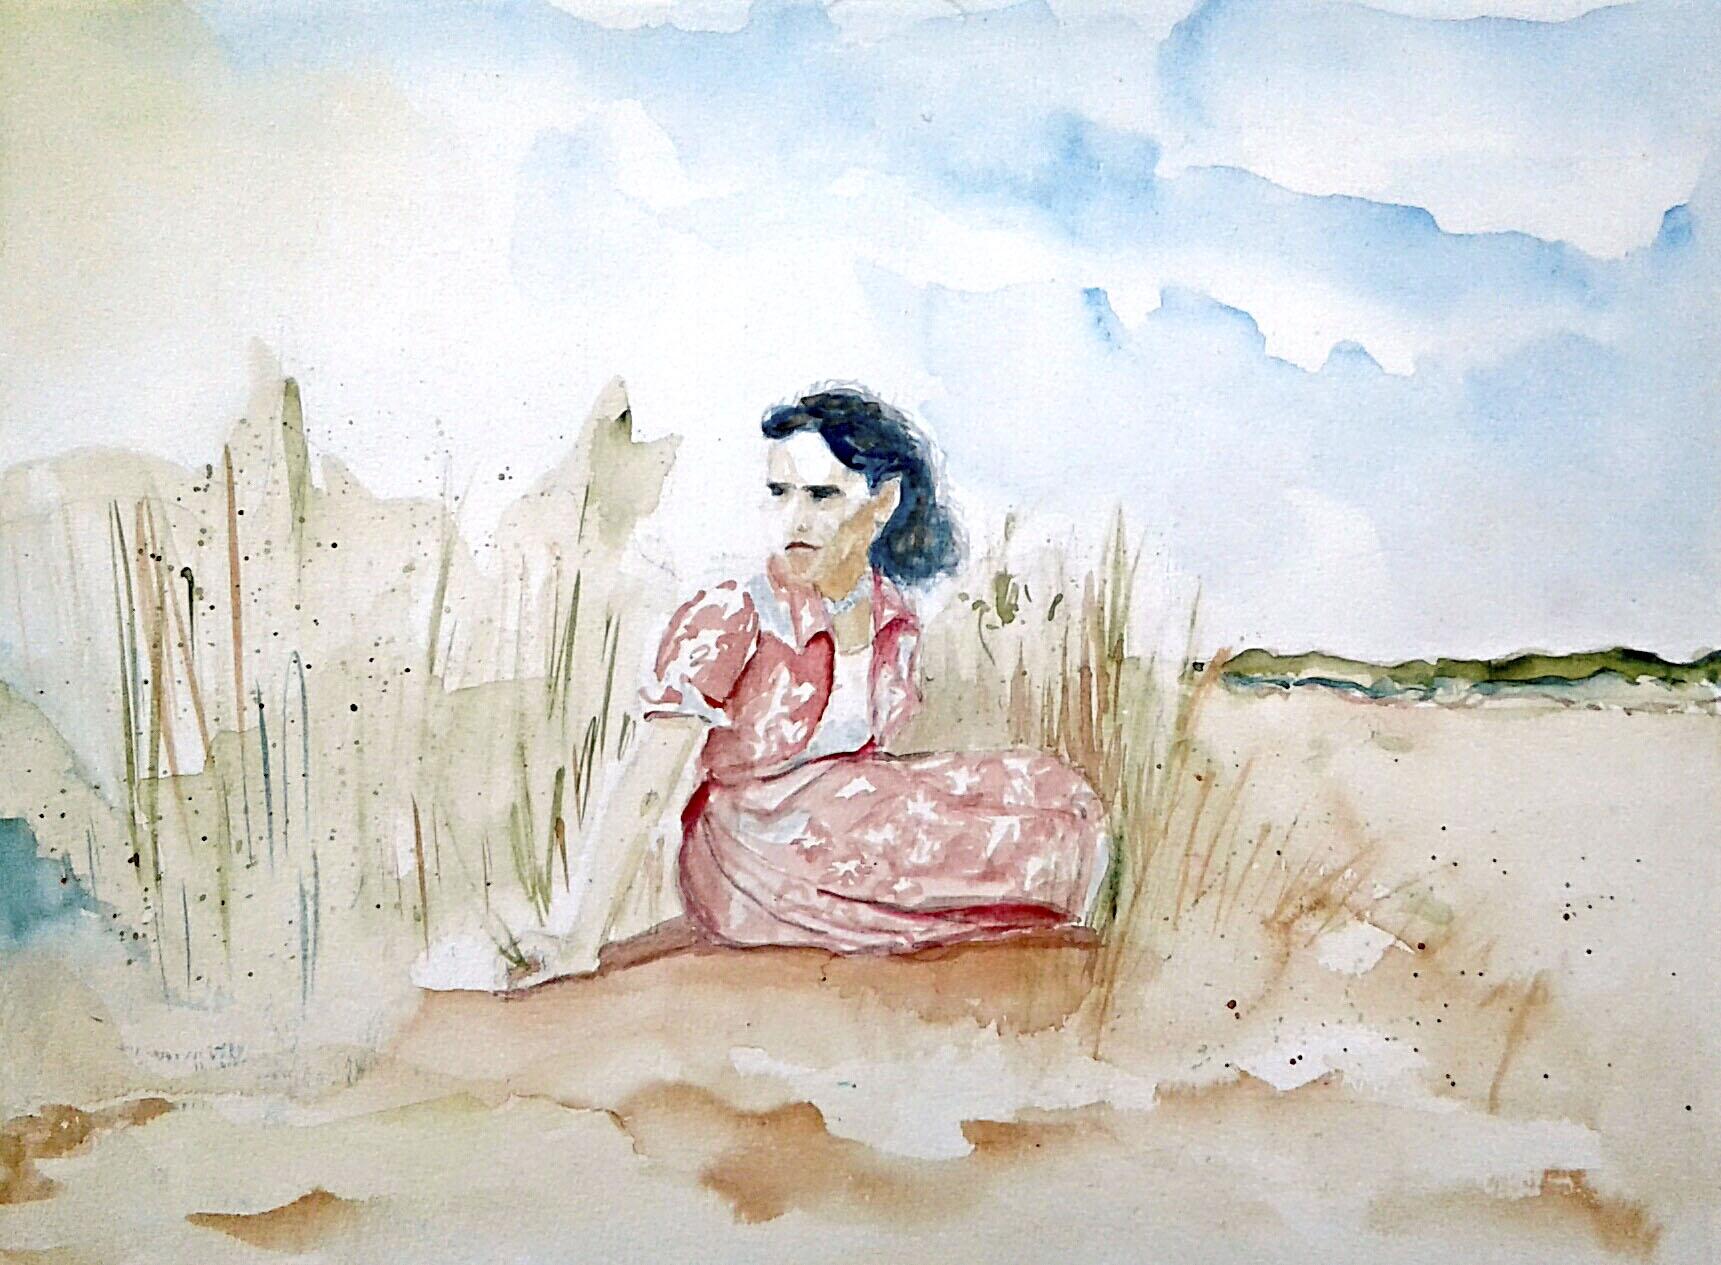 zomer 1953, Gonnie